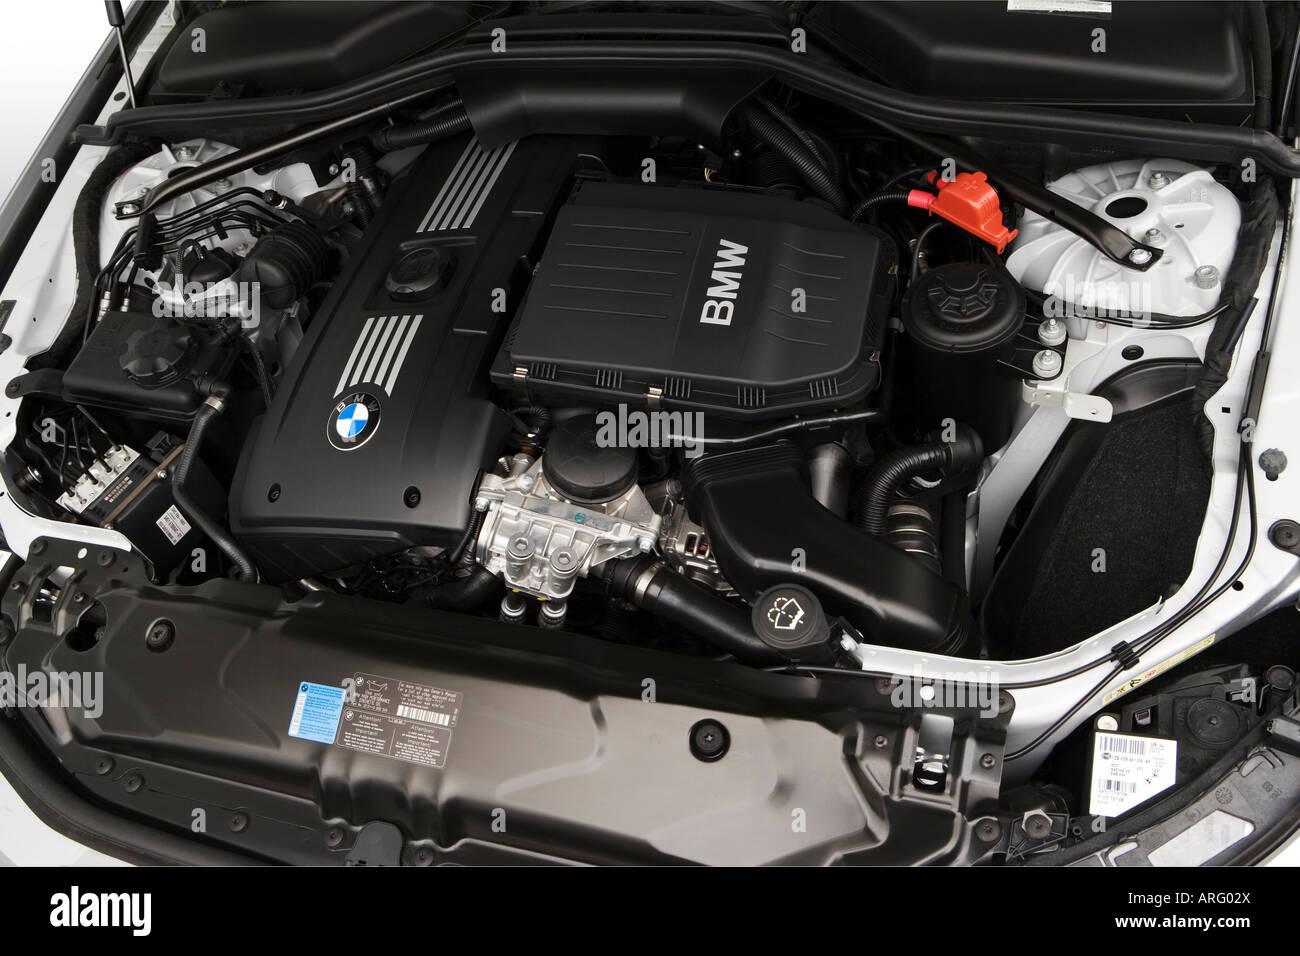 2008 BMW 5-Series 535xi Sports Wagon in Silver - Engine